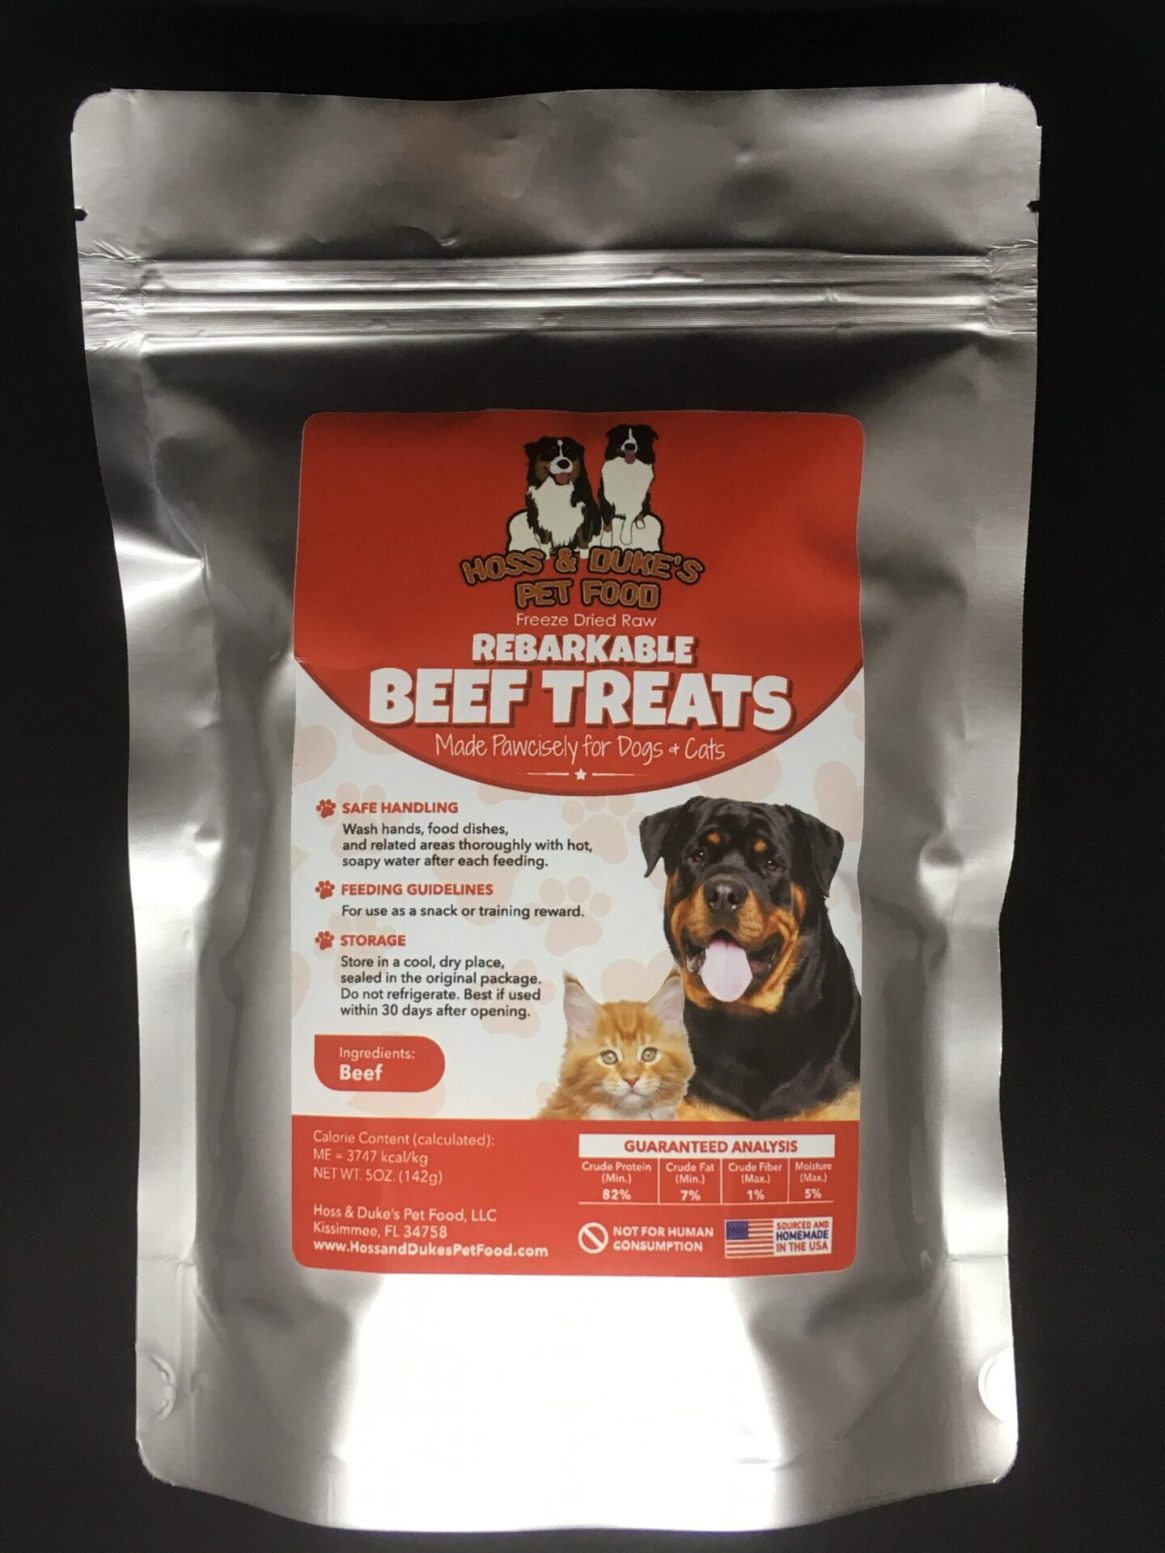 Hoss & Duke's Rebarkable Beef Treats